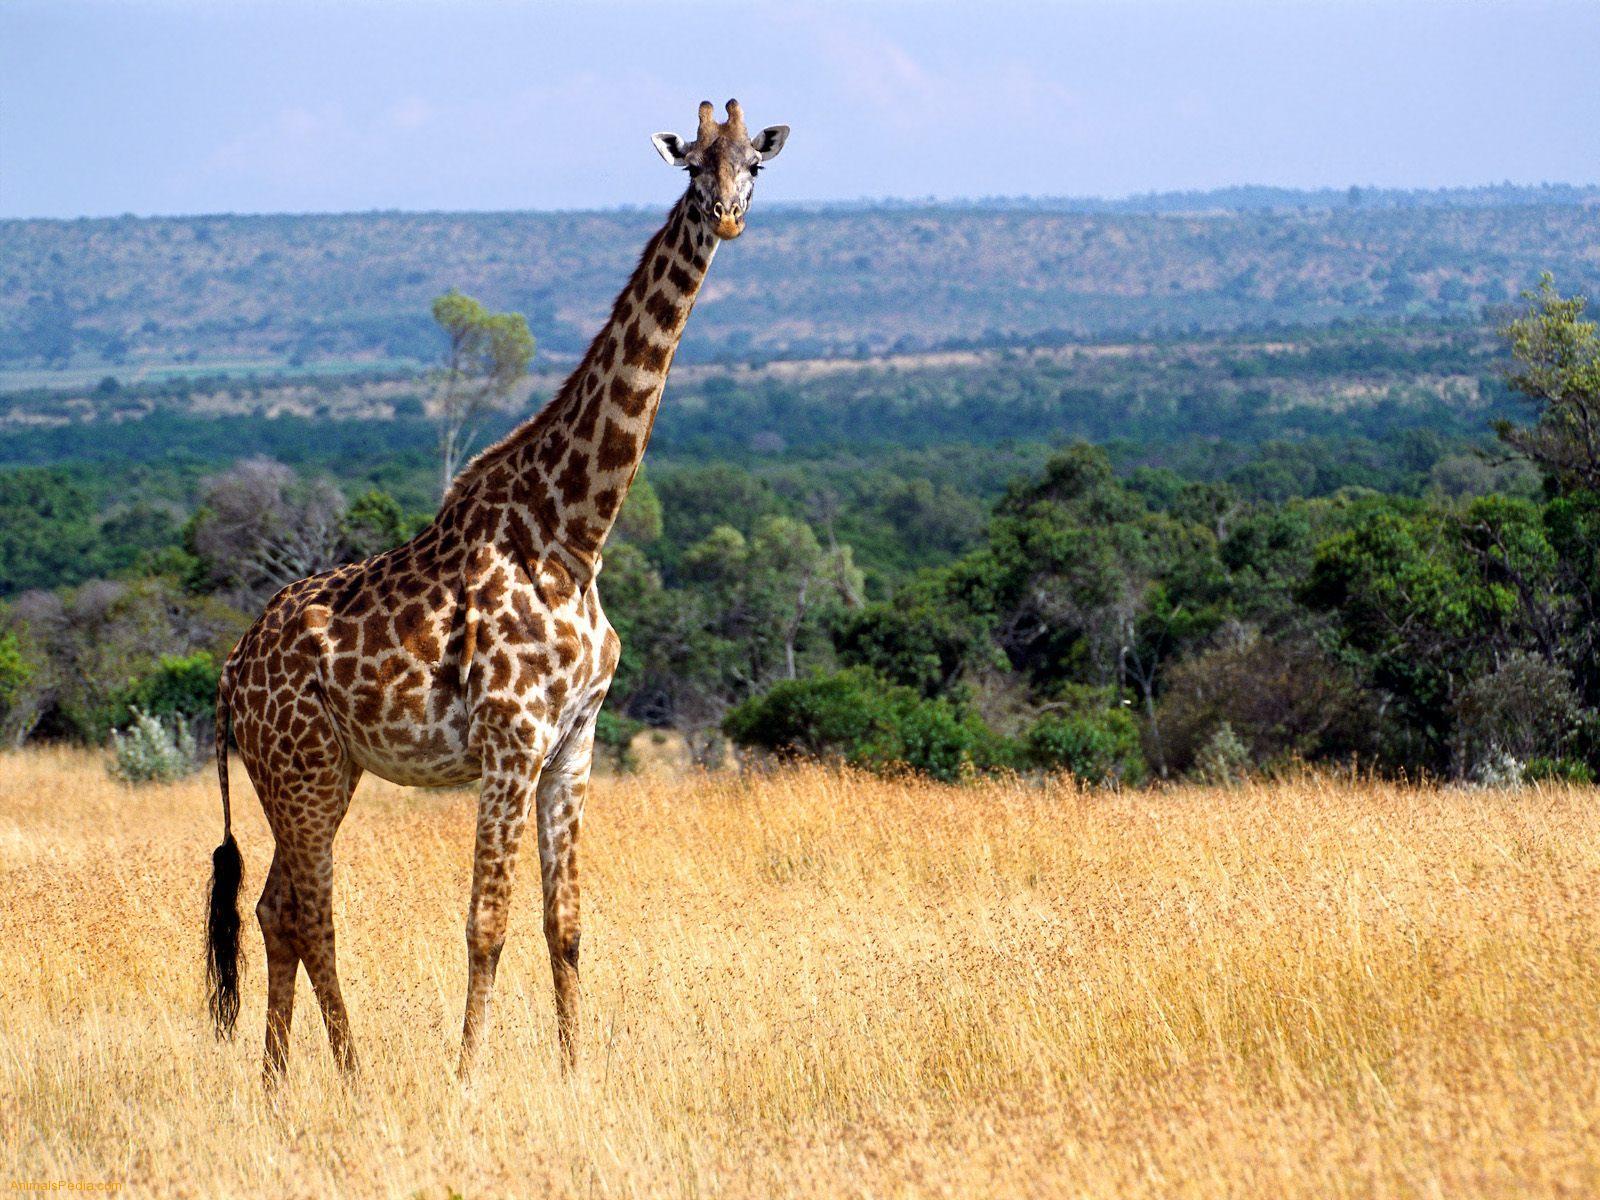 http://1.bp.blogspot.com/-IBavWw5i6Wo/T8wROeVPIJI/AAAAAAAAroQ/Z7KfRVbzQJQ/s1600/the%2Bdallest%2Bgiraffe%2Bin%2Bthe%2Bworld%2B%2Banimal%2Battacks%2Bnews%2BGiraffe-Masai-Mara-Game-Reserve-Kenya%2Banimal%2Bhunting%2Band%2Bthe%2Bbest%2Btravel%2B%2Bafrican%2Bsafari%2Bdestination%2Banimal%2Bpictures.jpg